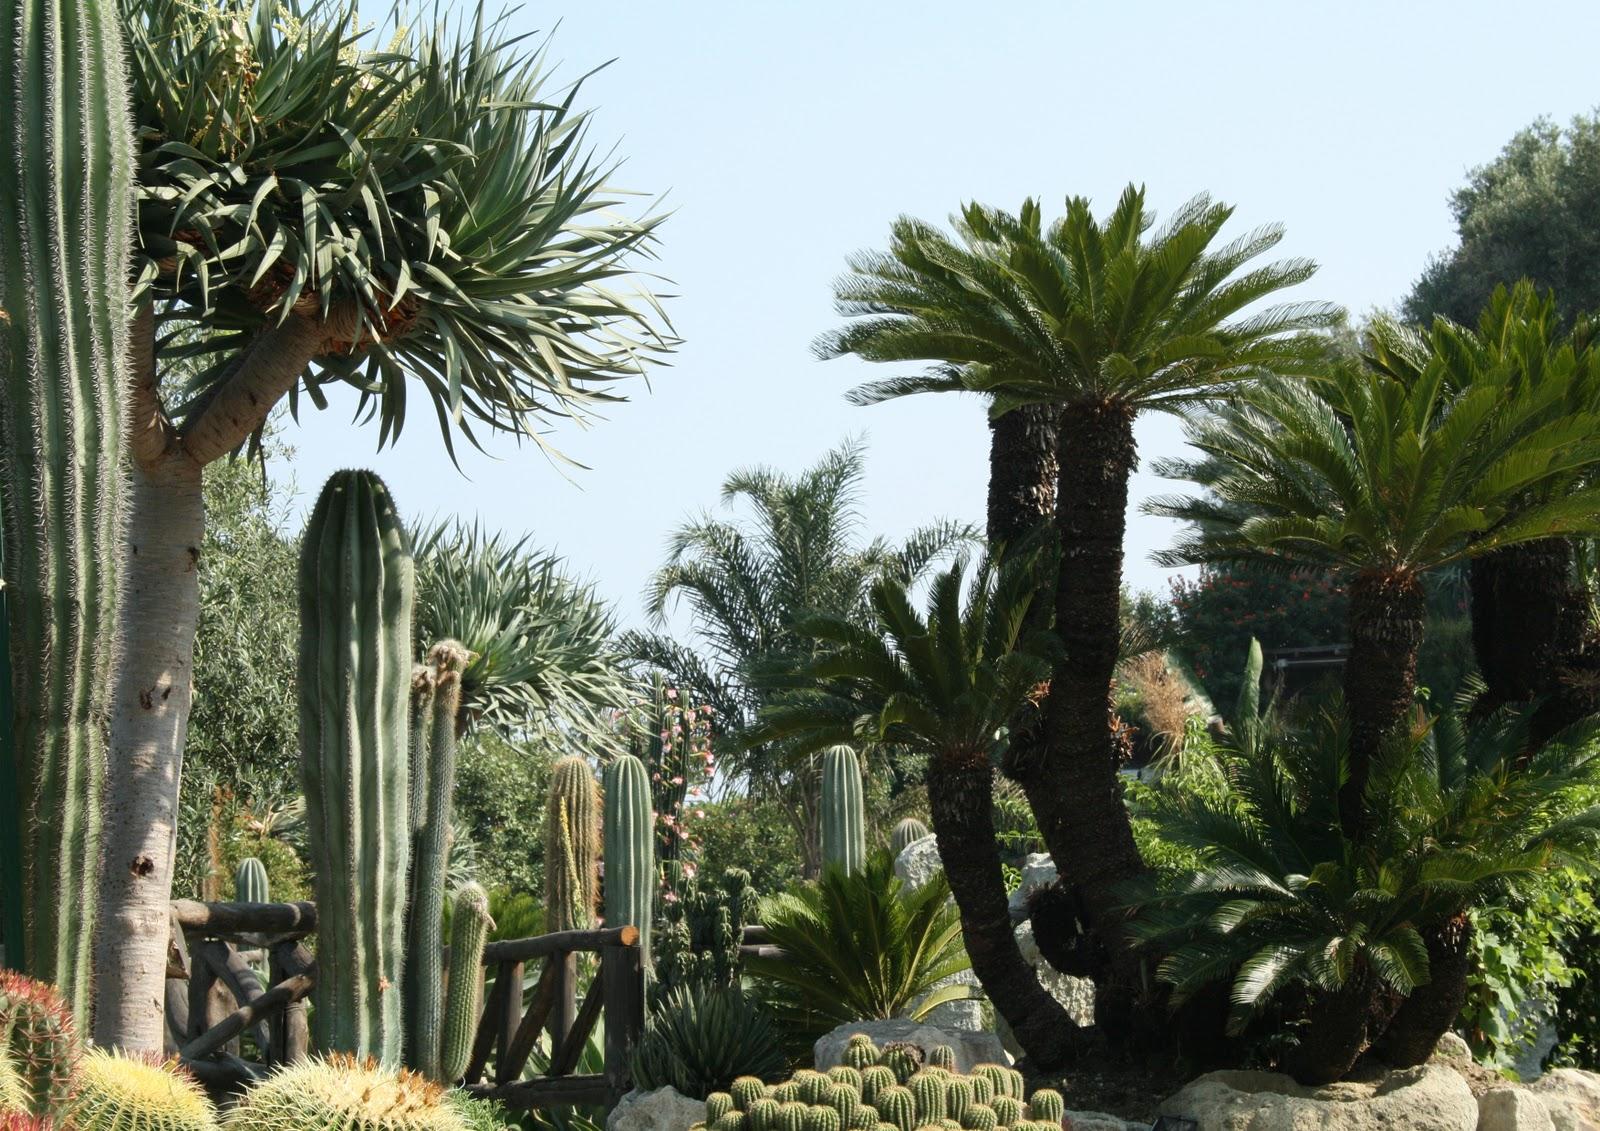 Ischia residence ravino un giardino botanico for Piante colonnari